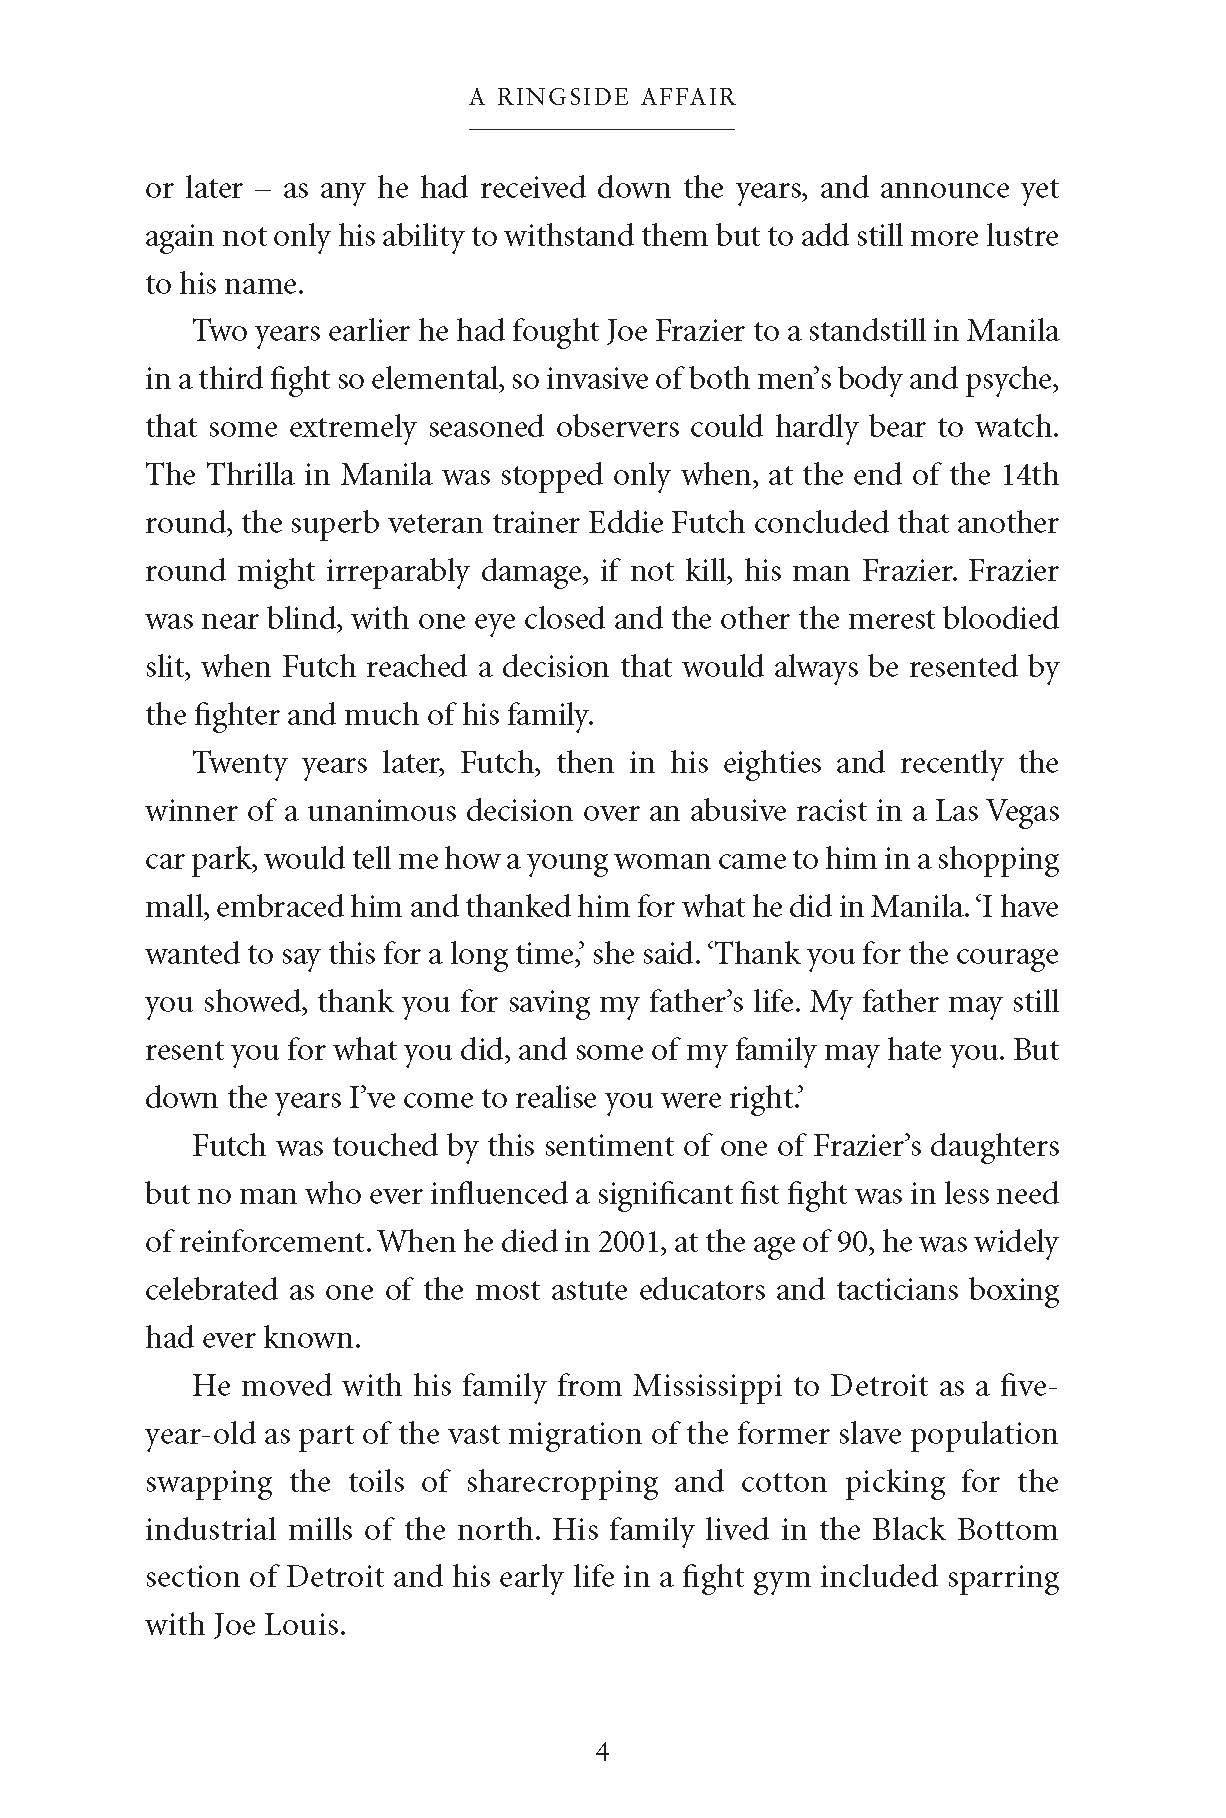 A Ringside Affair: Boxing's Last Golden Age: James Lawton